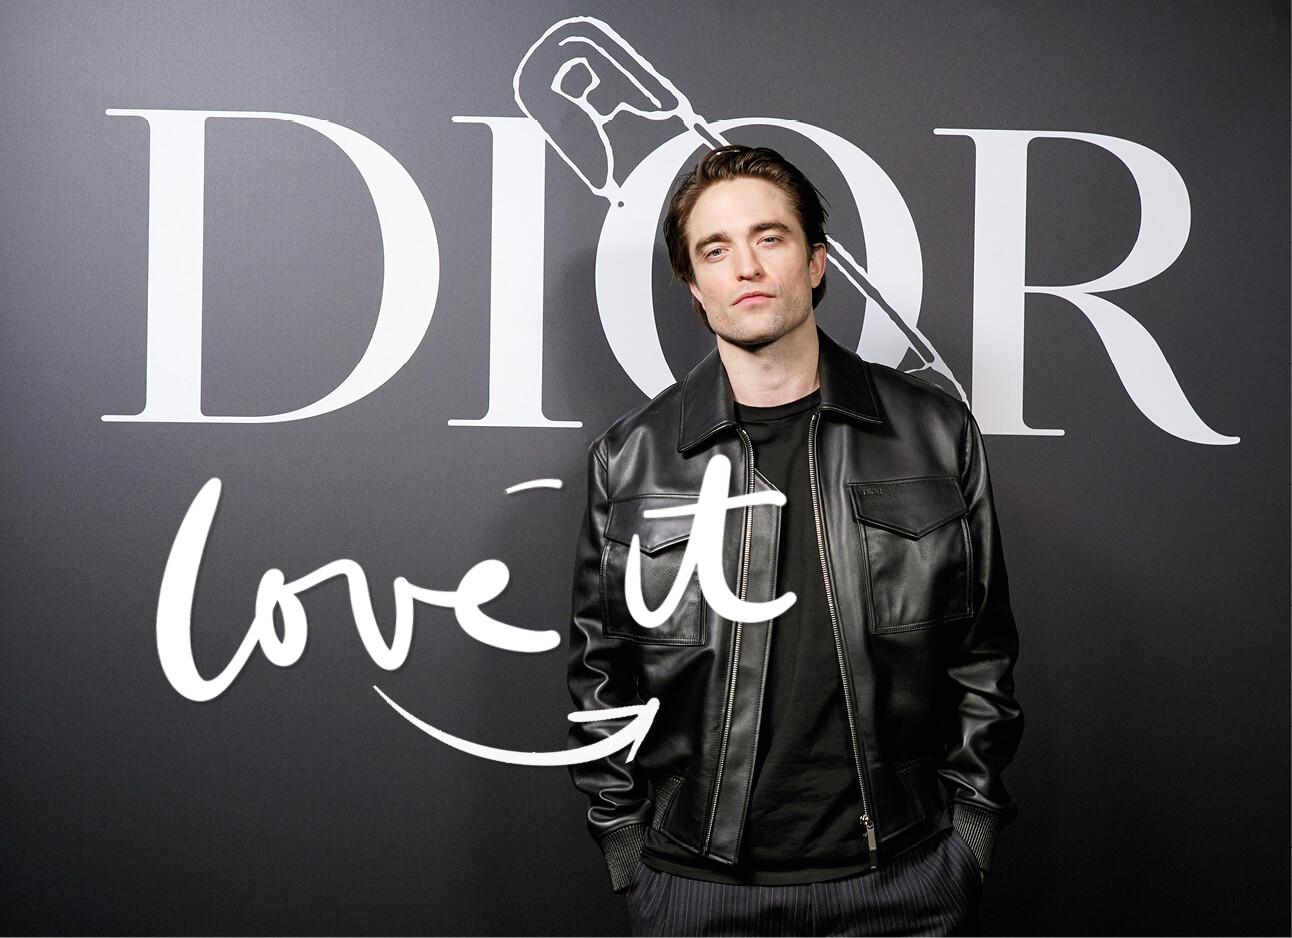 Robert Pattinson als nieuwe Batman